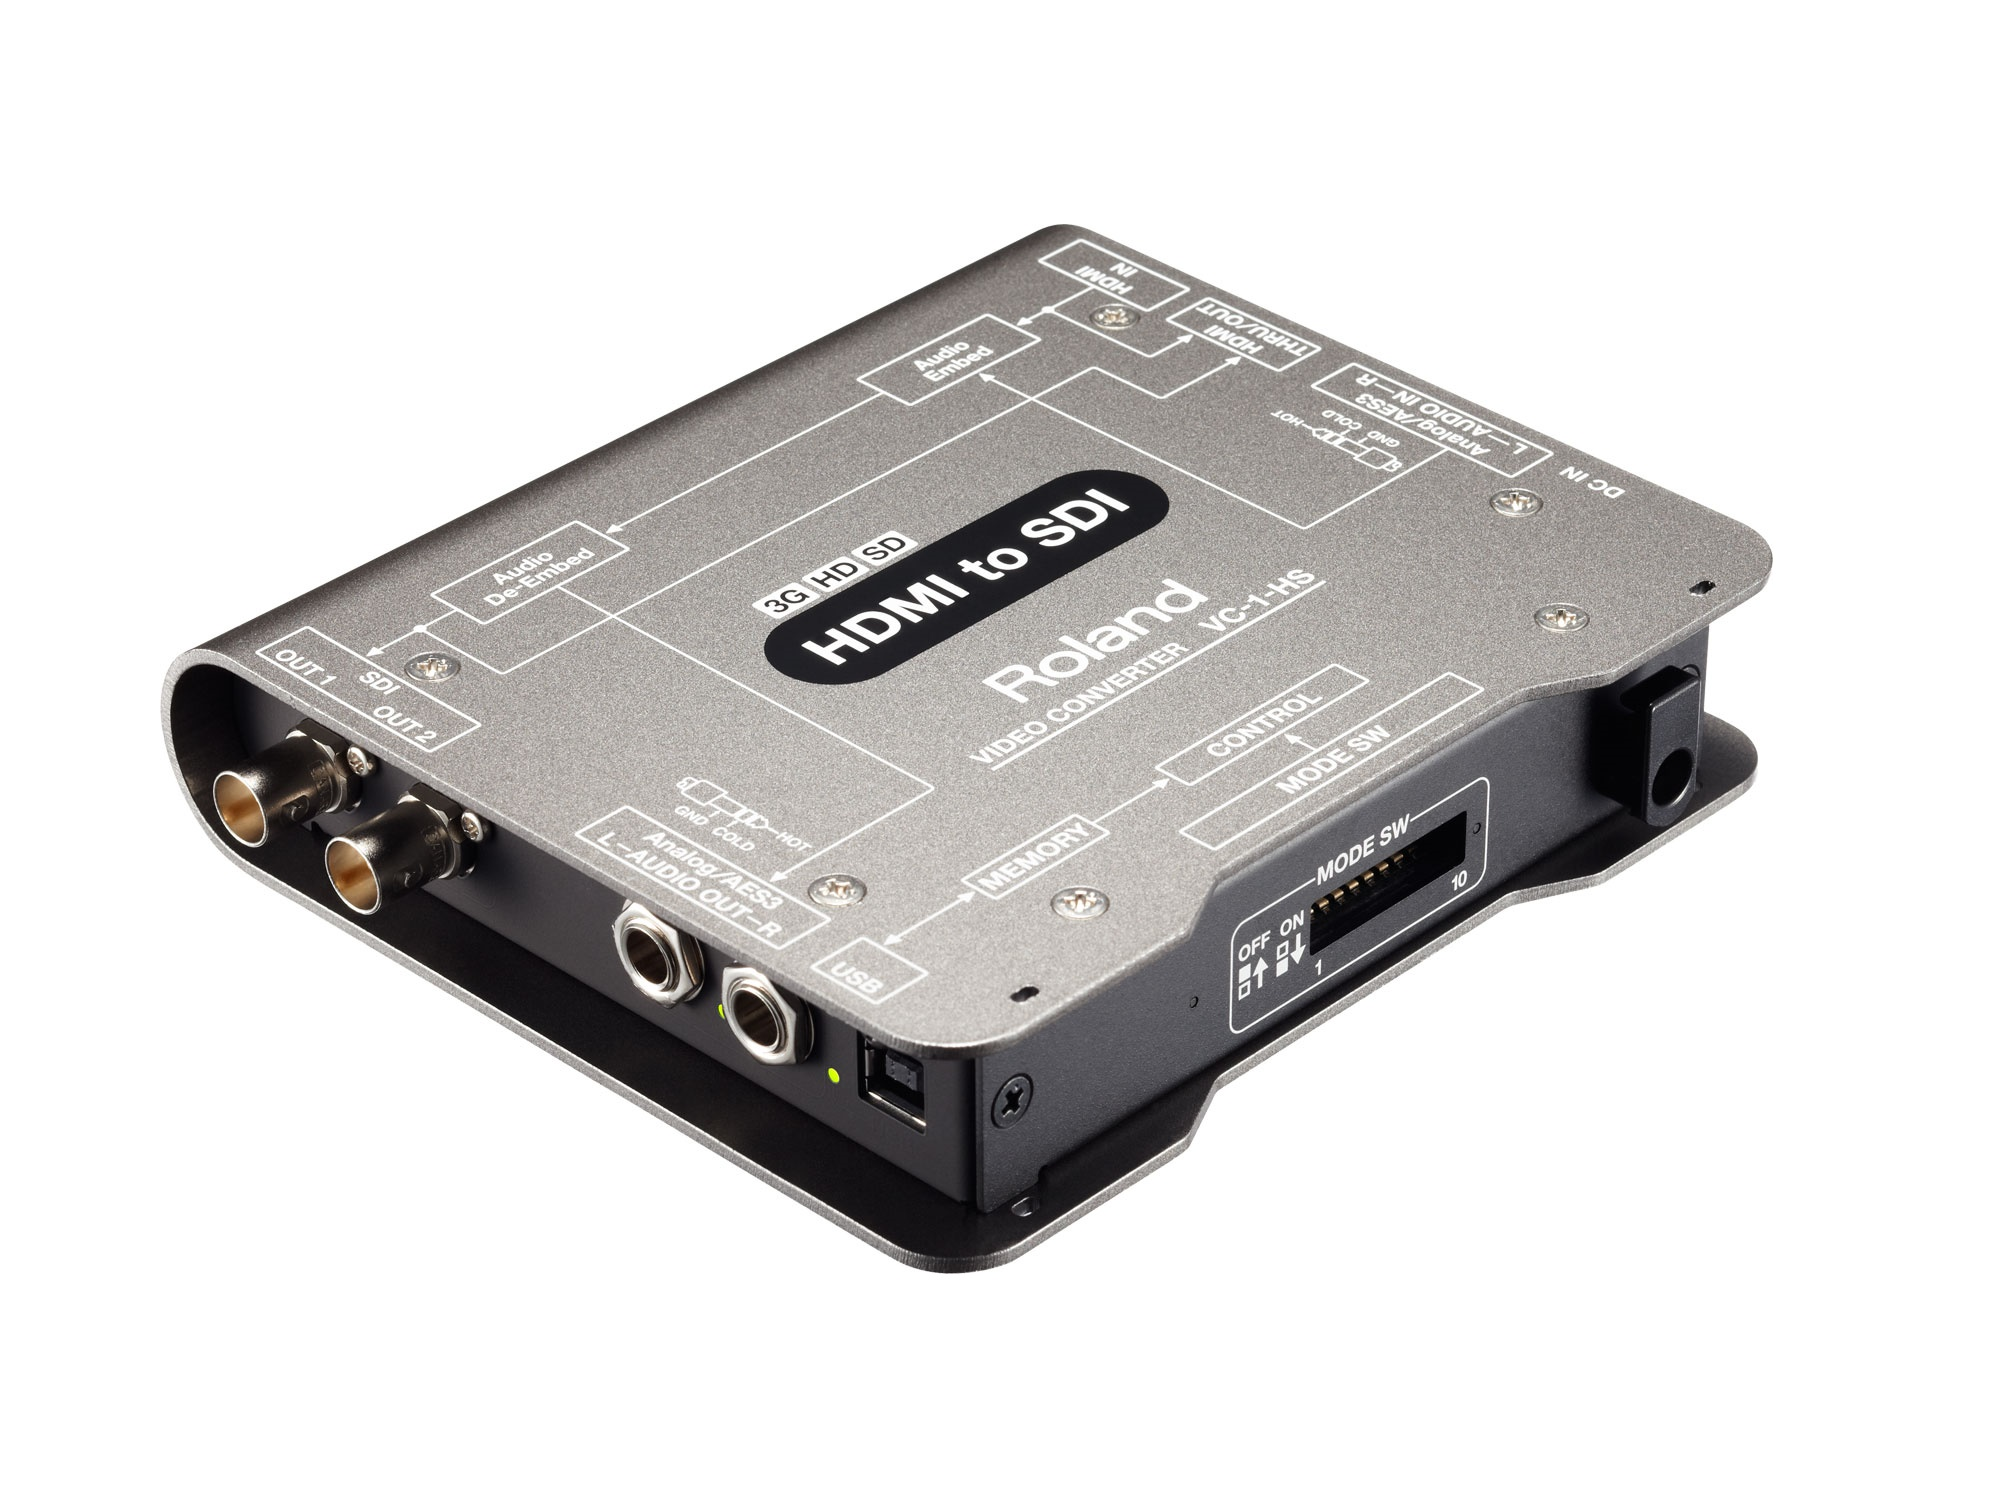 Roland VC-1-HS HDMI to SDI Video Converter